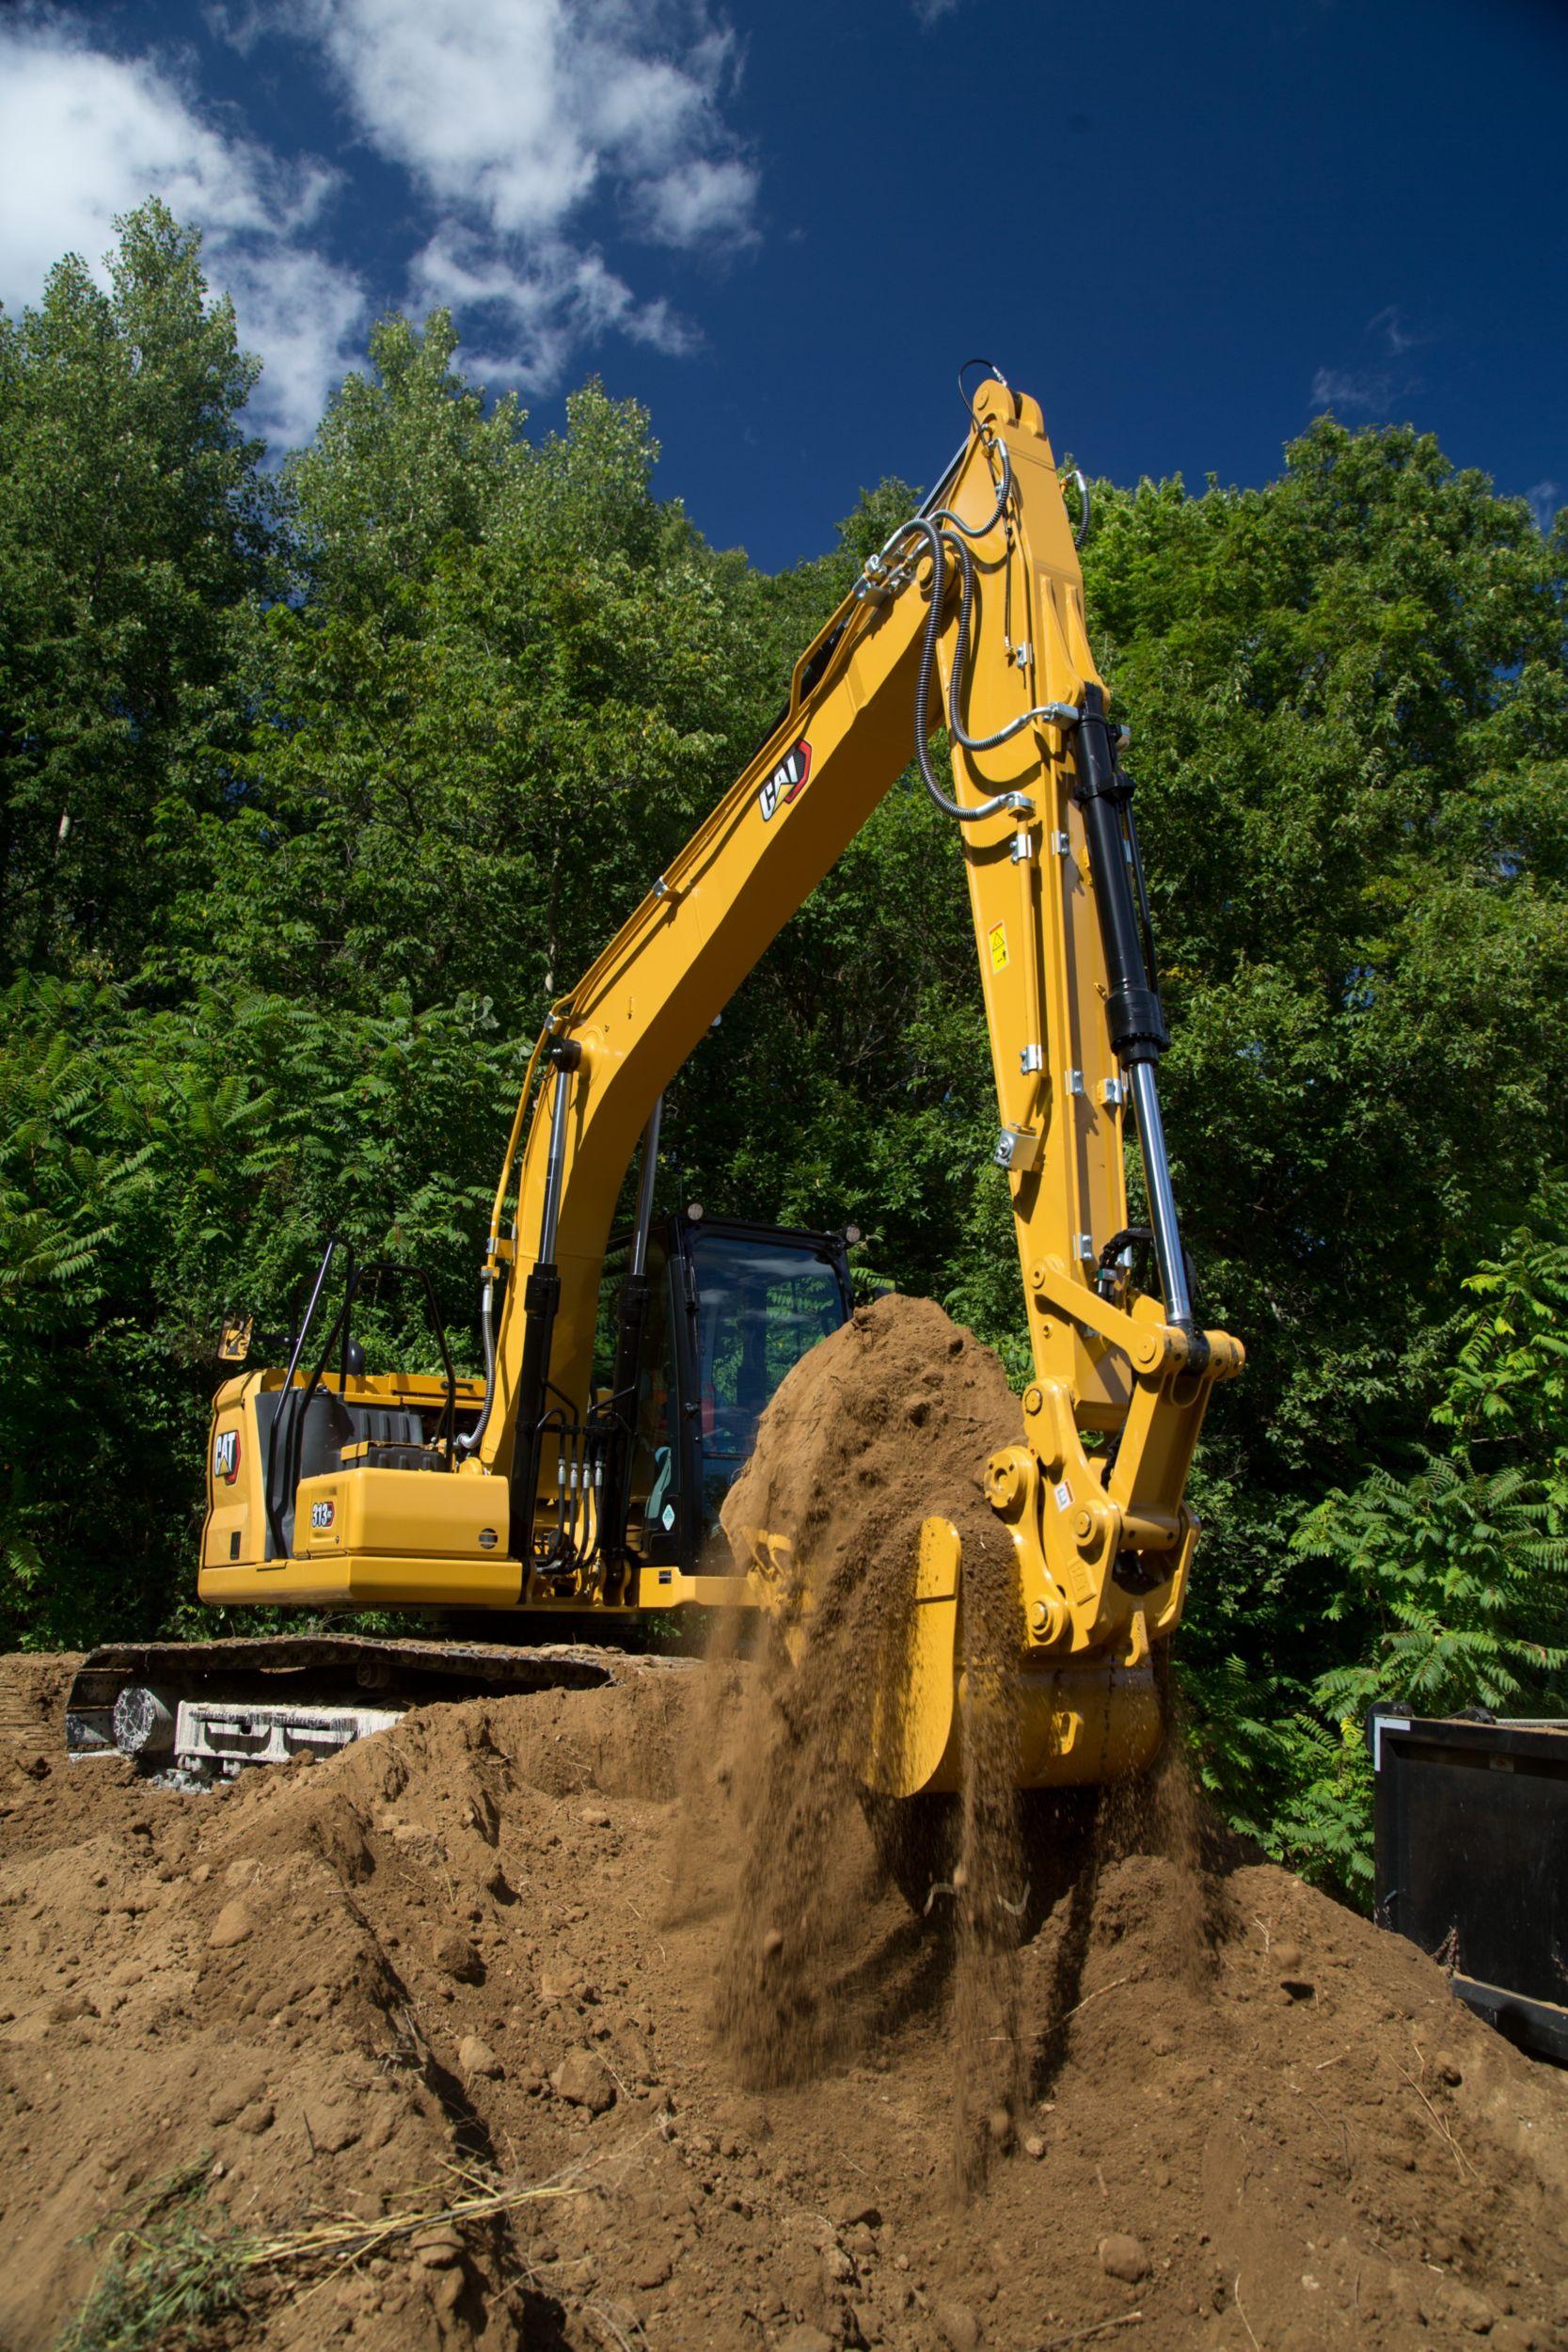 313 GC Bucket Full of Dirt>